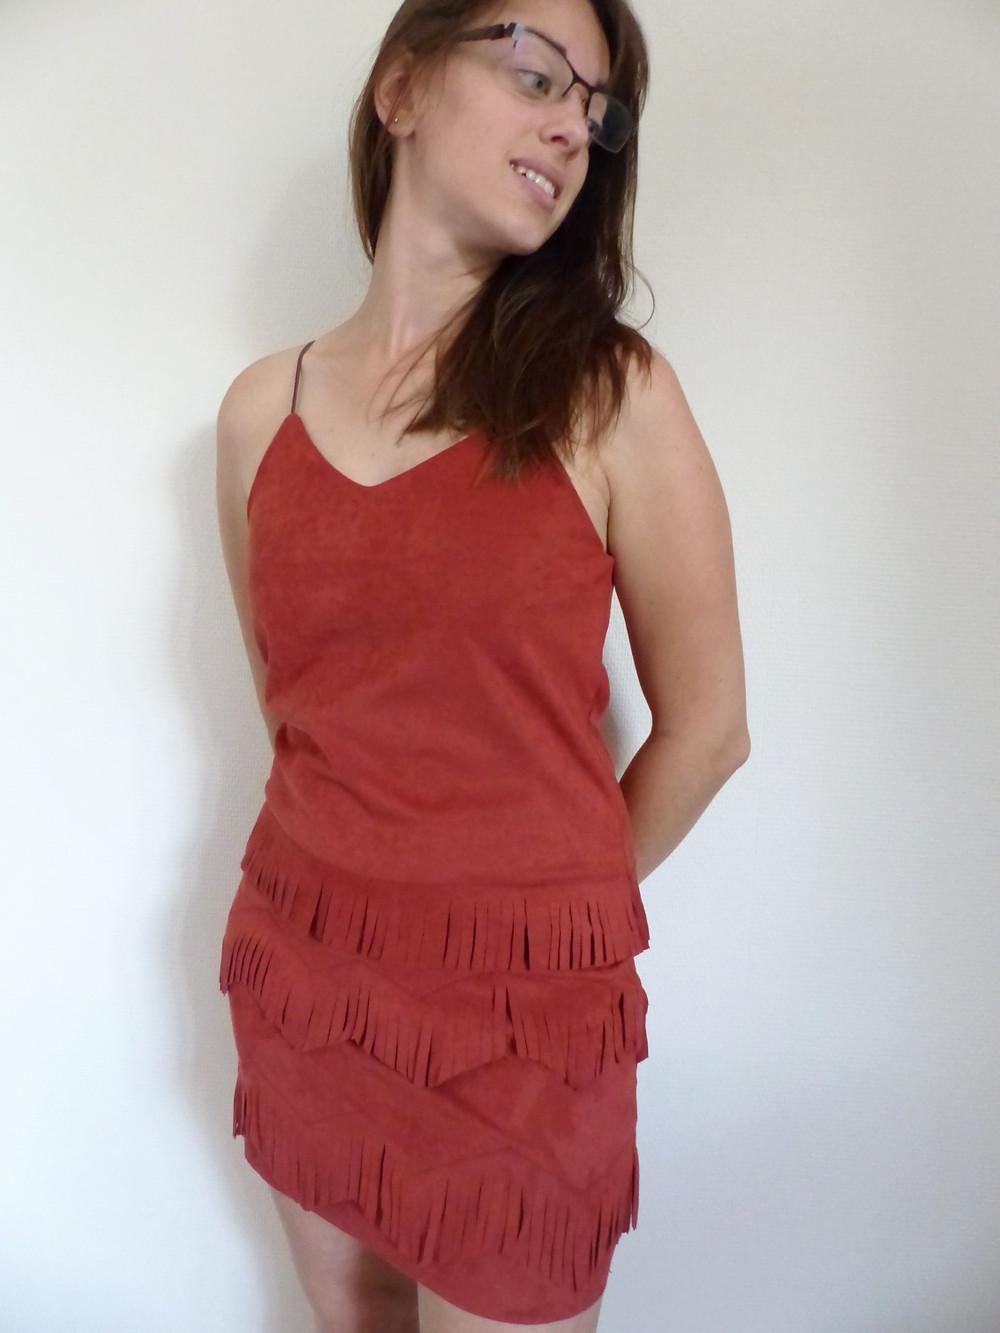 La Robe Tempete Rouge Vetement Inspiration Amerindienne